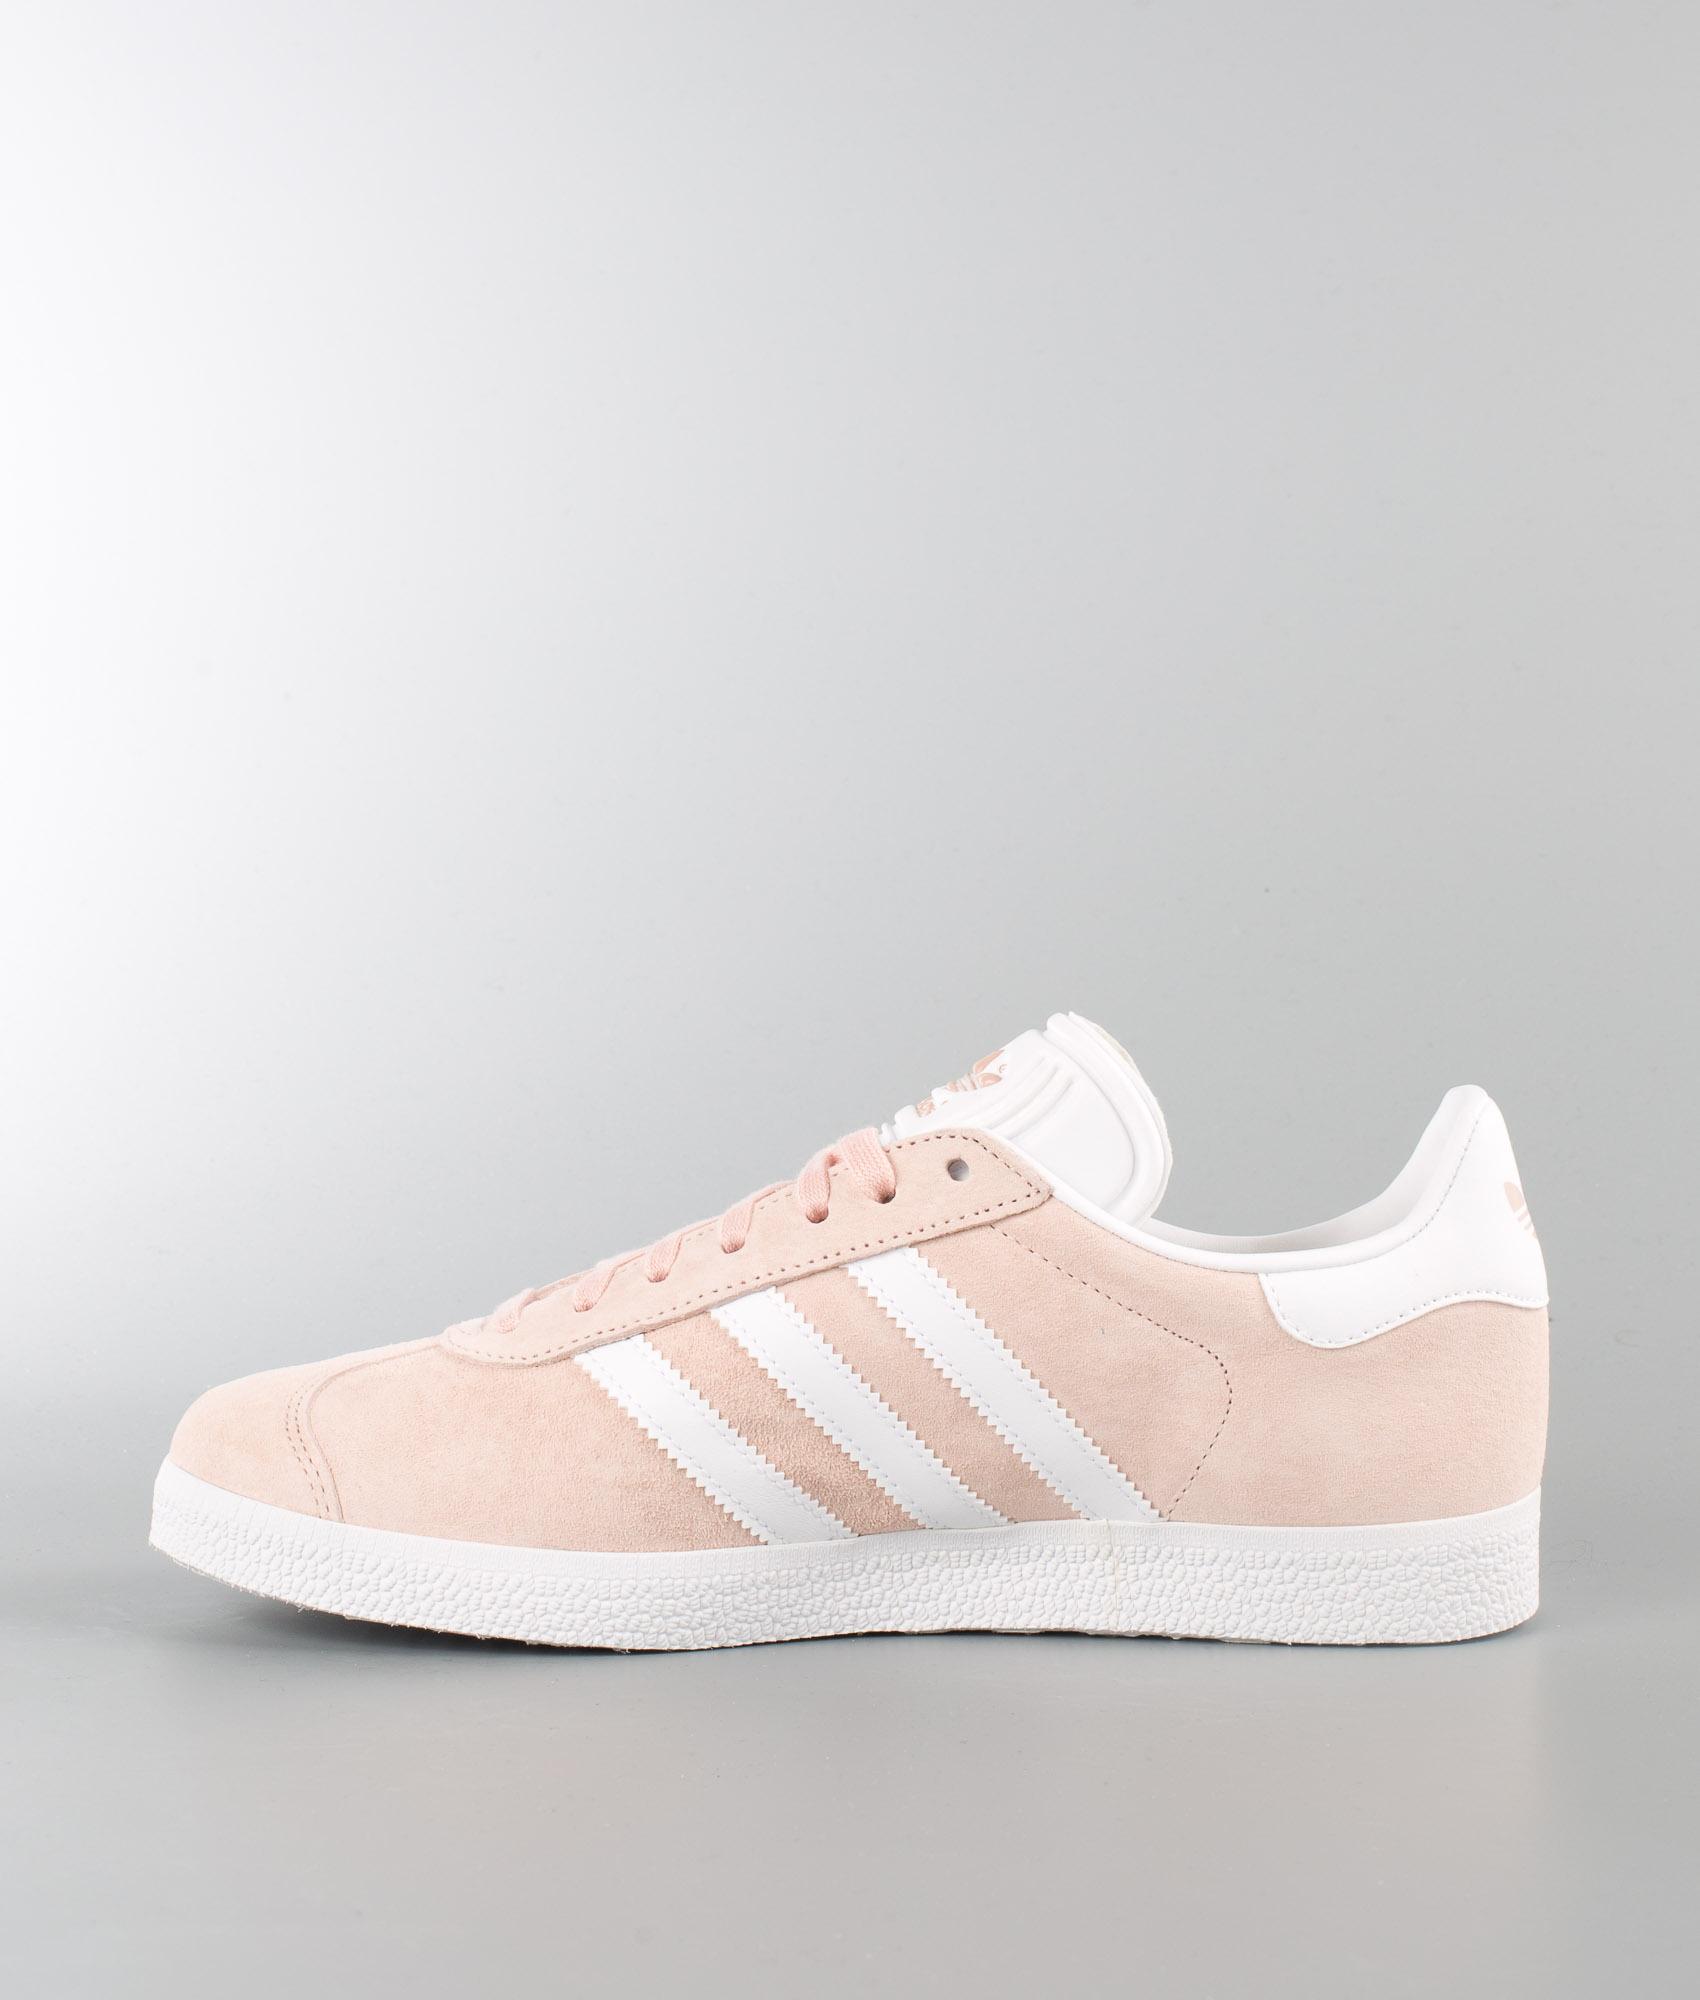 Adidas Originals Gazelle Schuhe Vapour PinkWhiteGoldmt